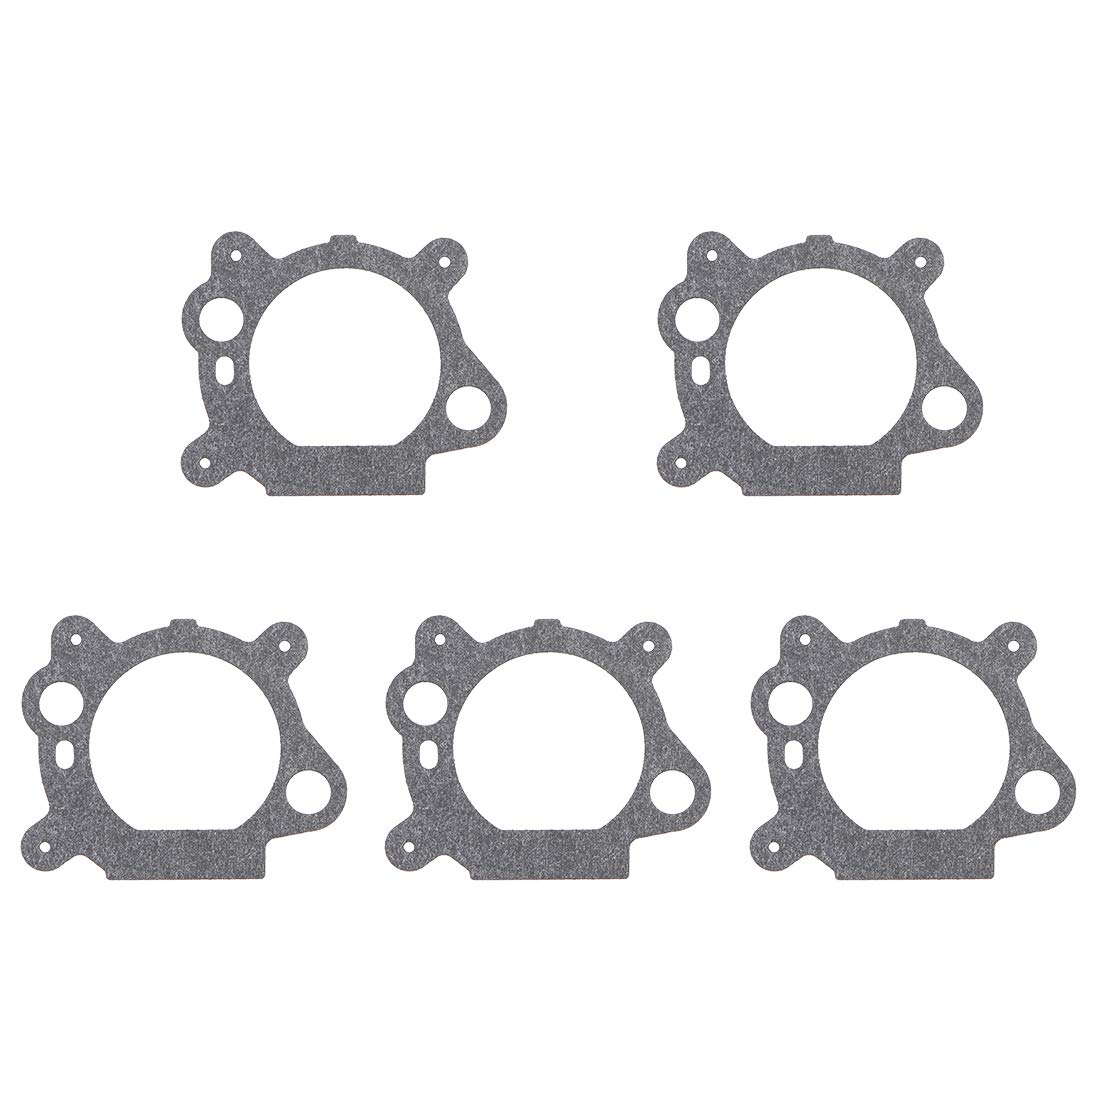 uxcell 95-526 Carburetor Rebuild Kit Gasket Diaphragm for Walbro WA WT WY WZ Series Carburetor Engines Carb